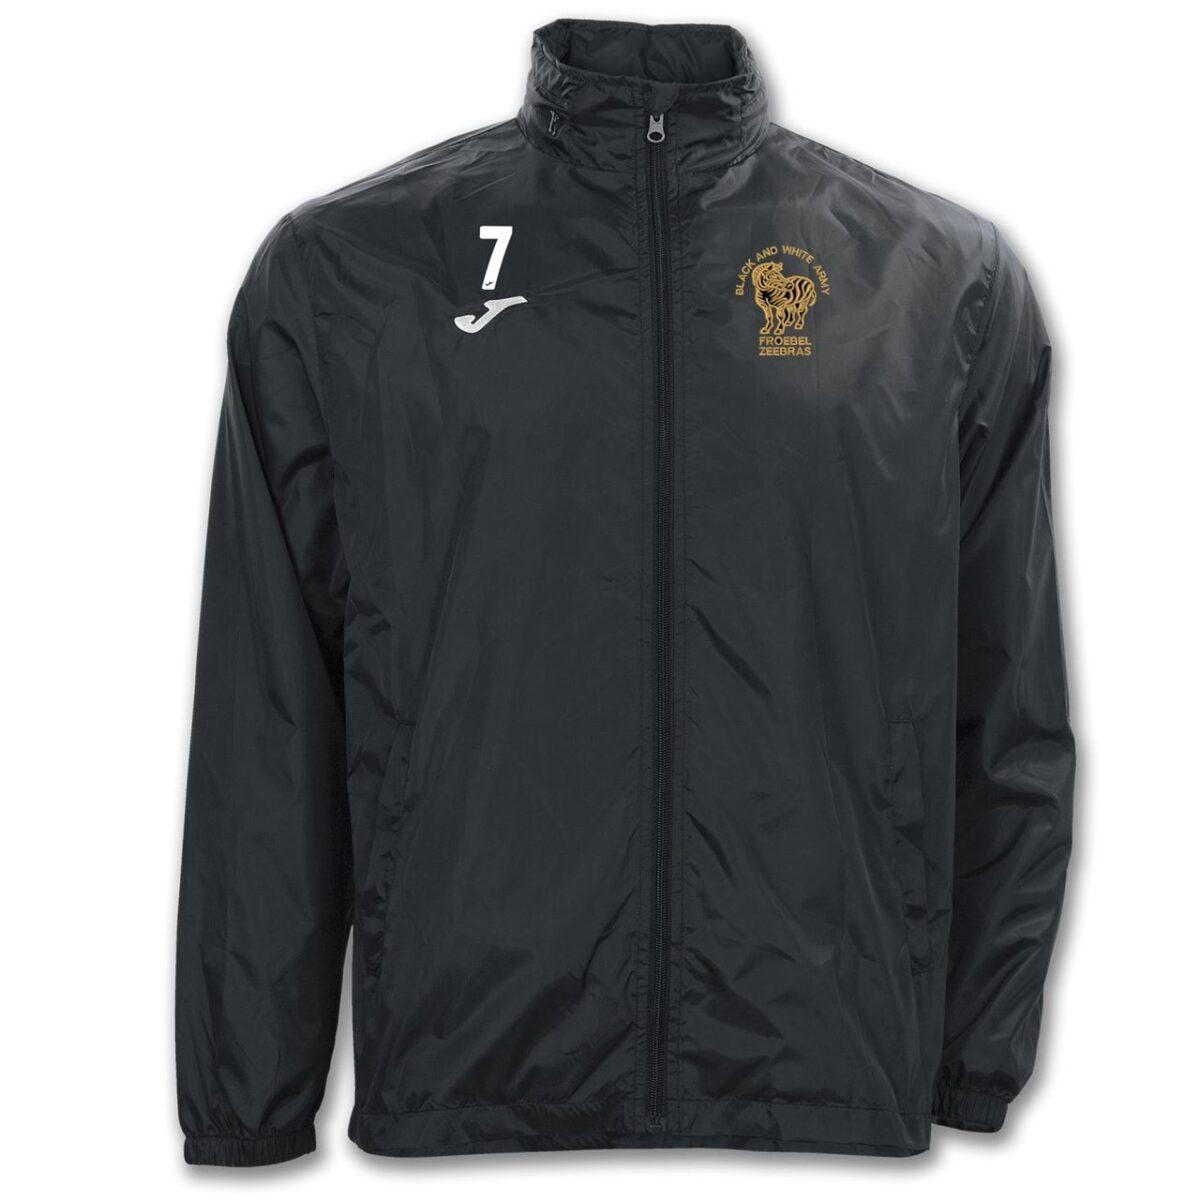 Rainjacket - Froebel Zeebras FC